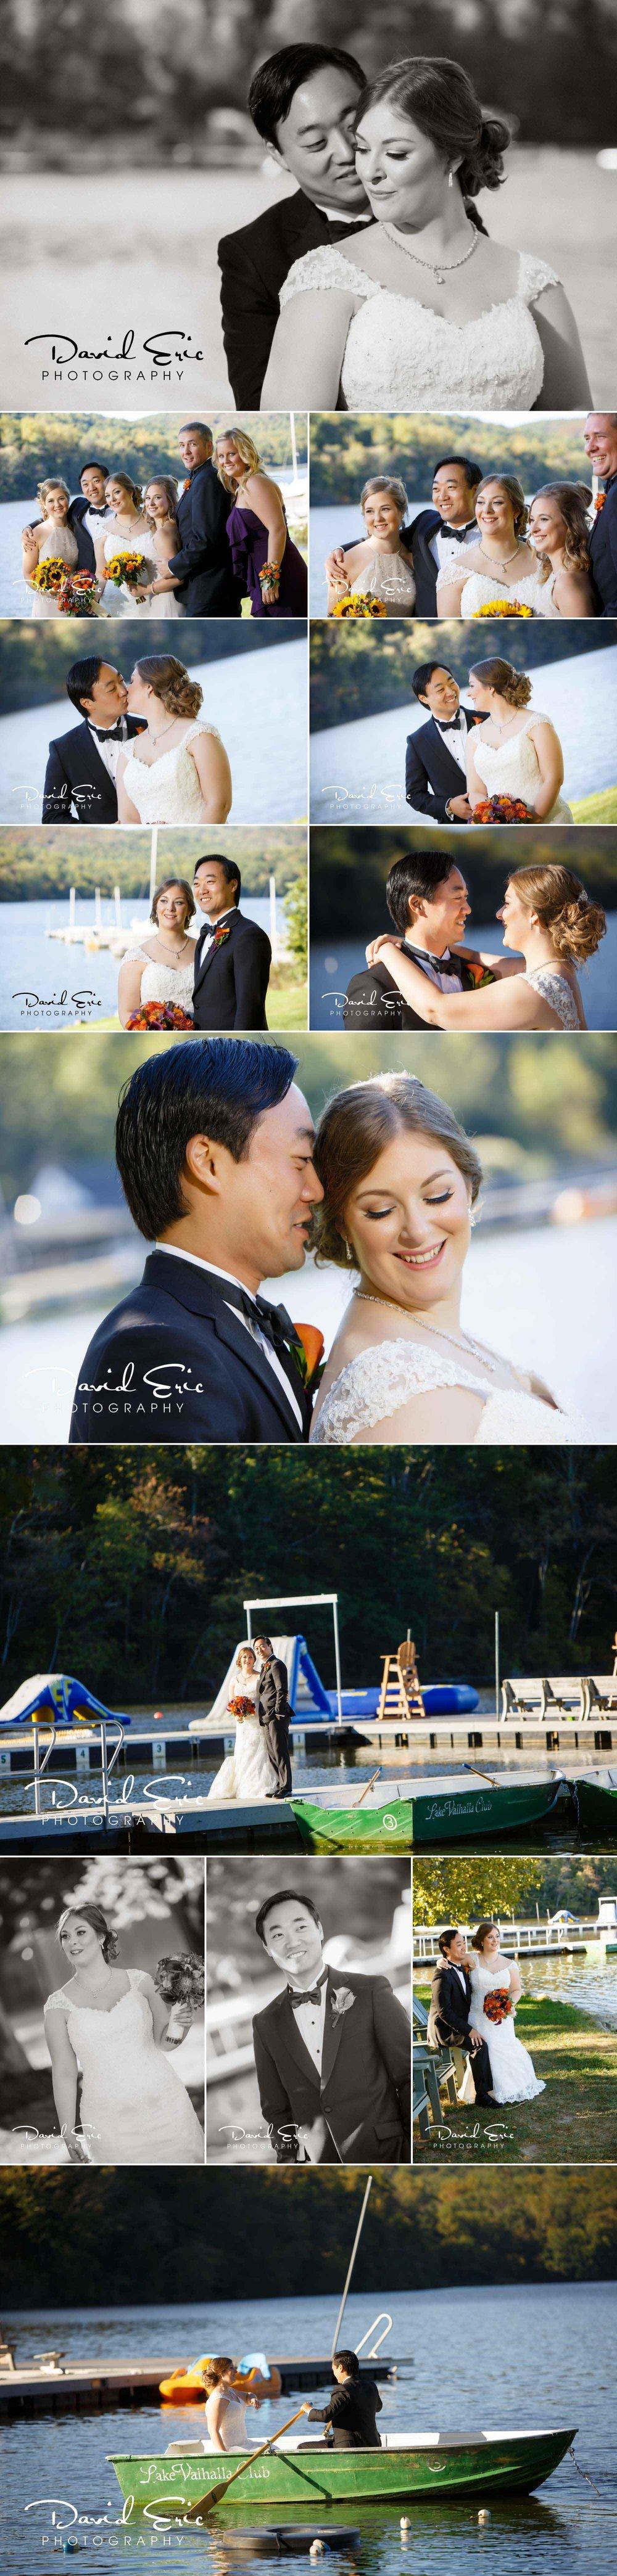 Lake Valhalla Club wedding bride and groom photos